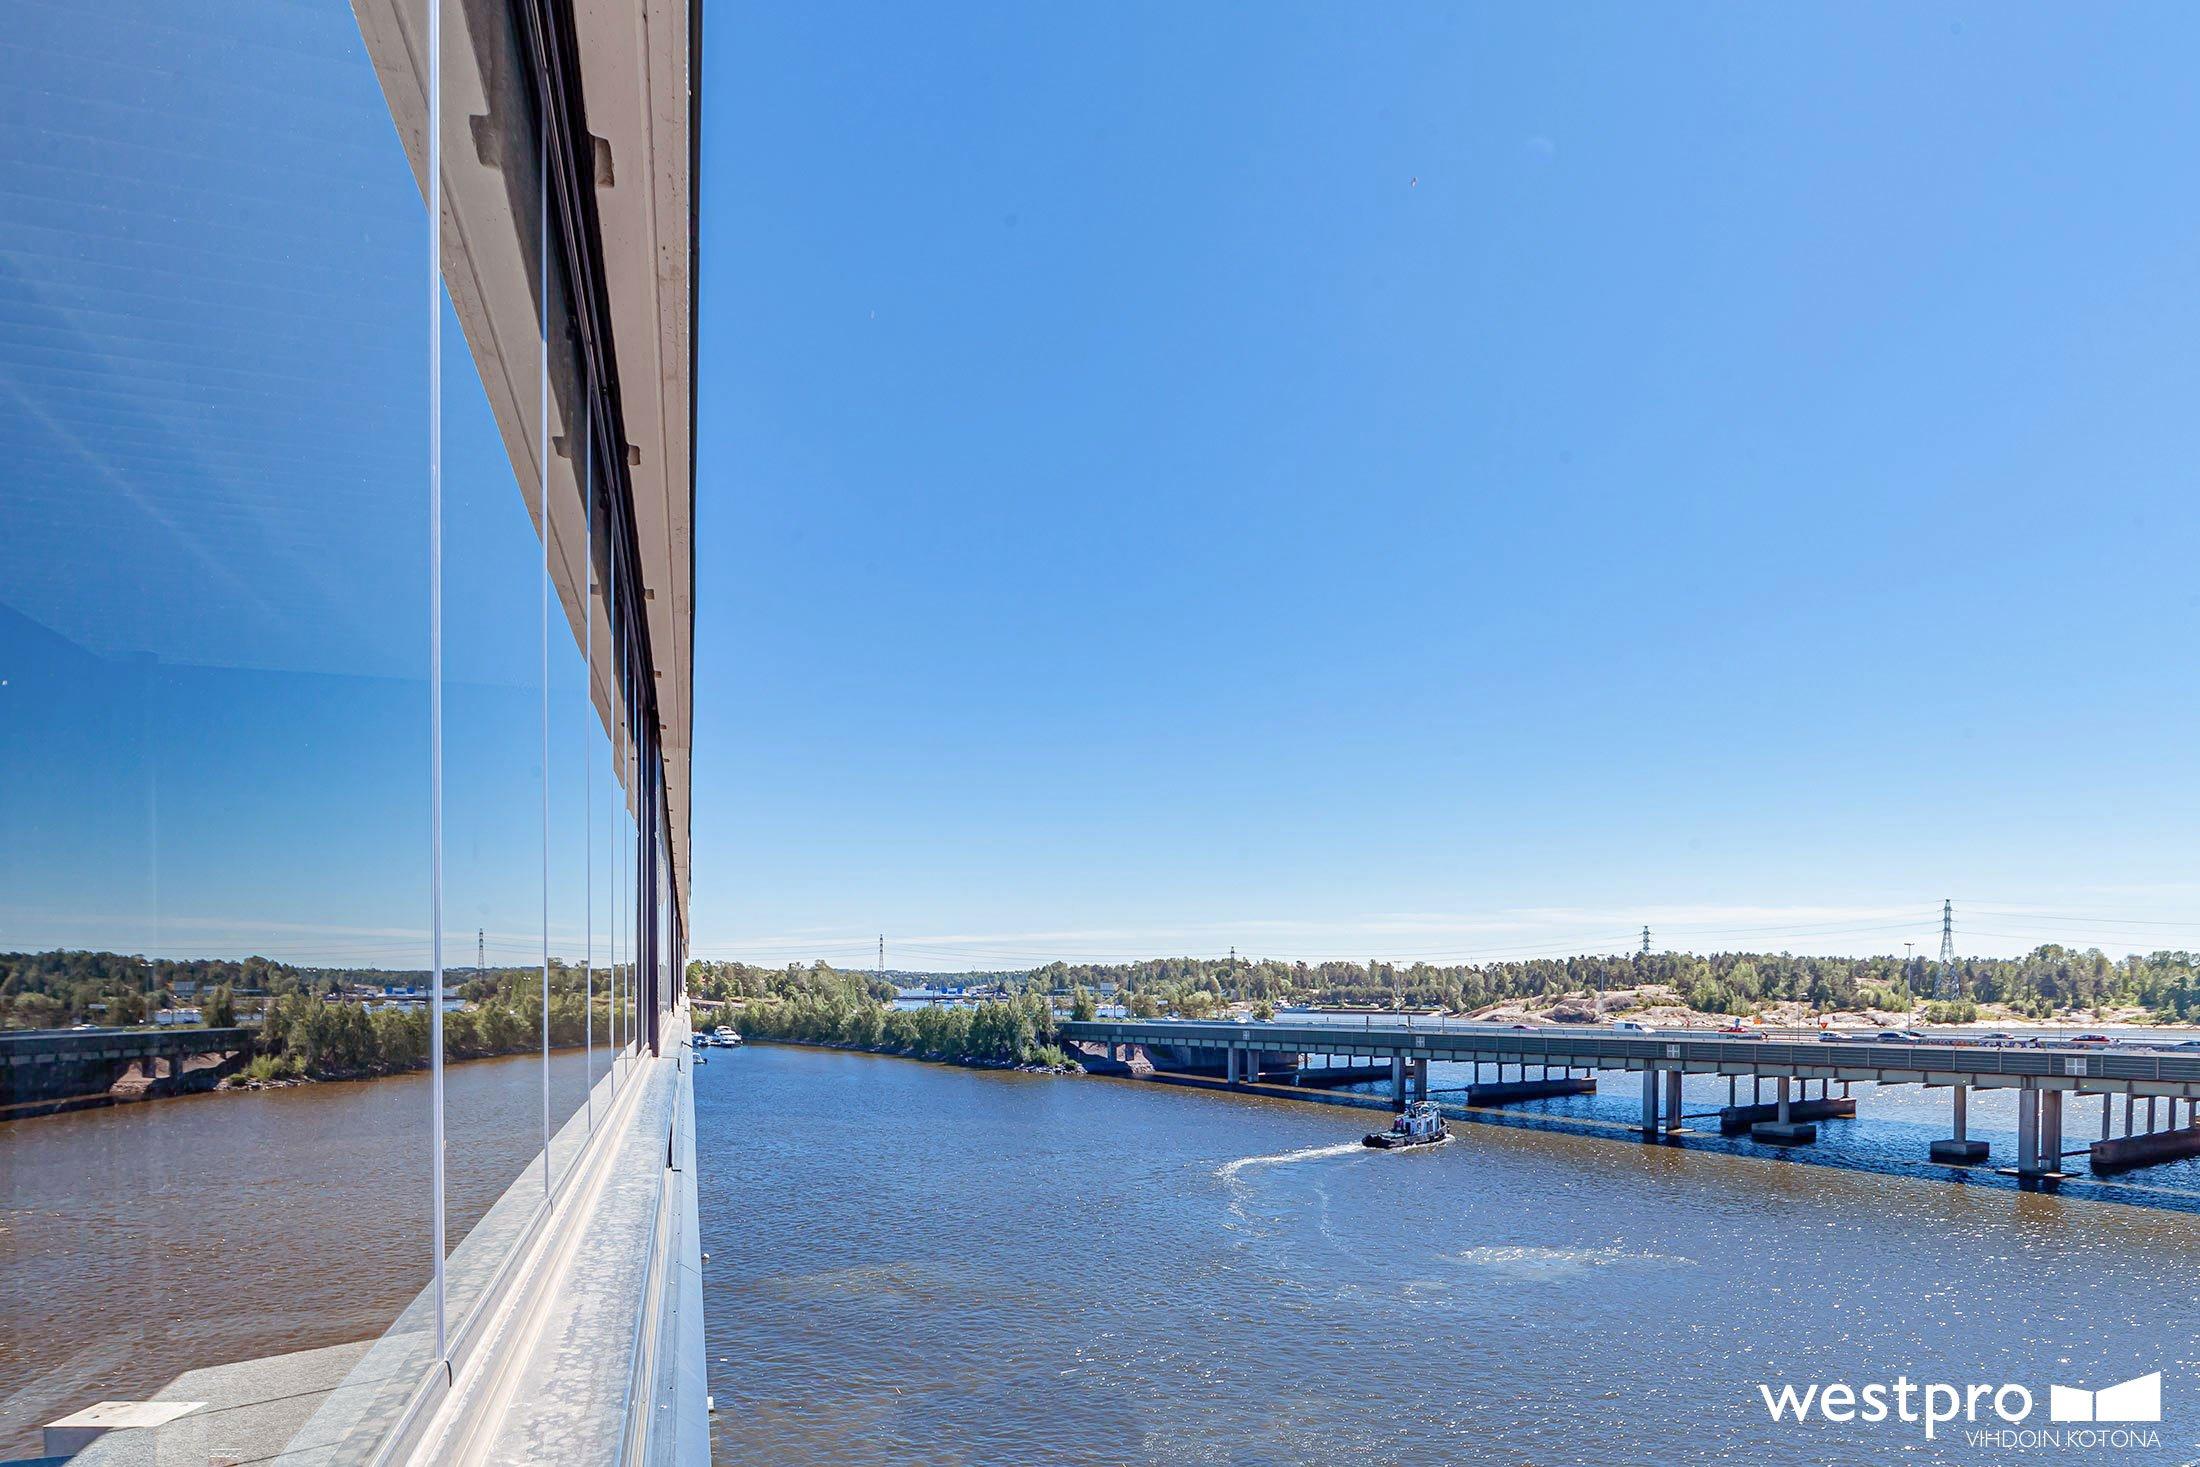 Westpro-Portus,-Verkkosaari-view